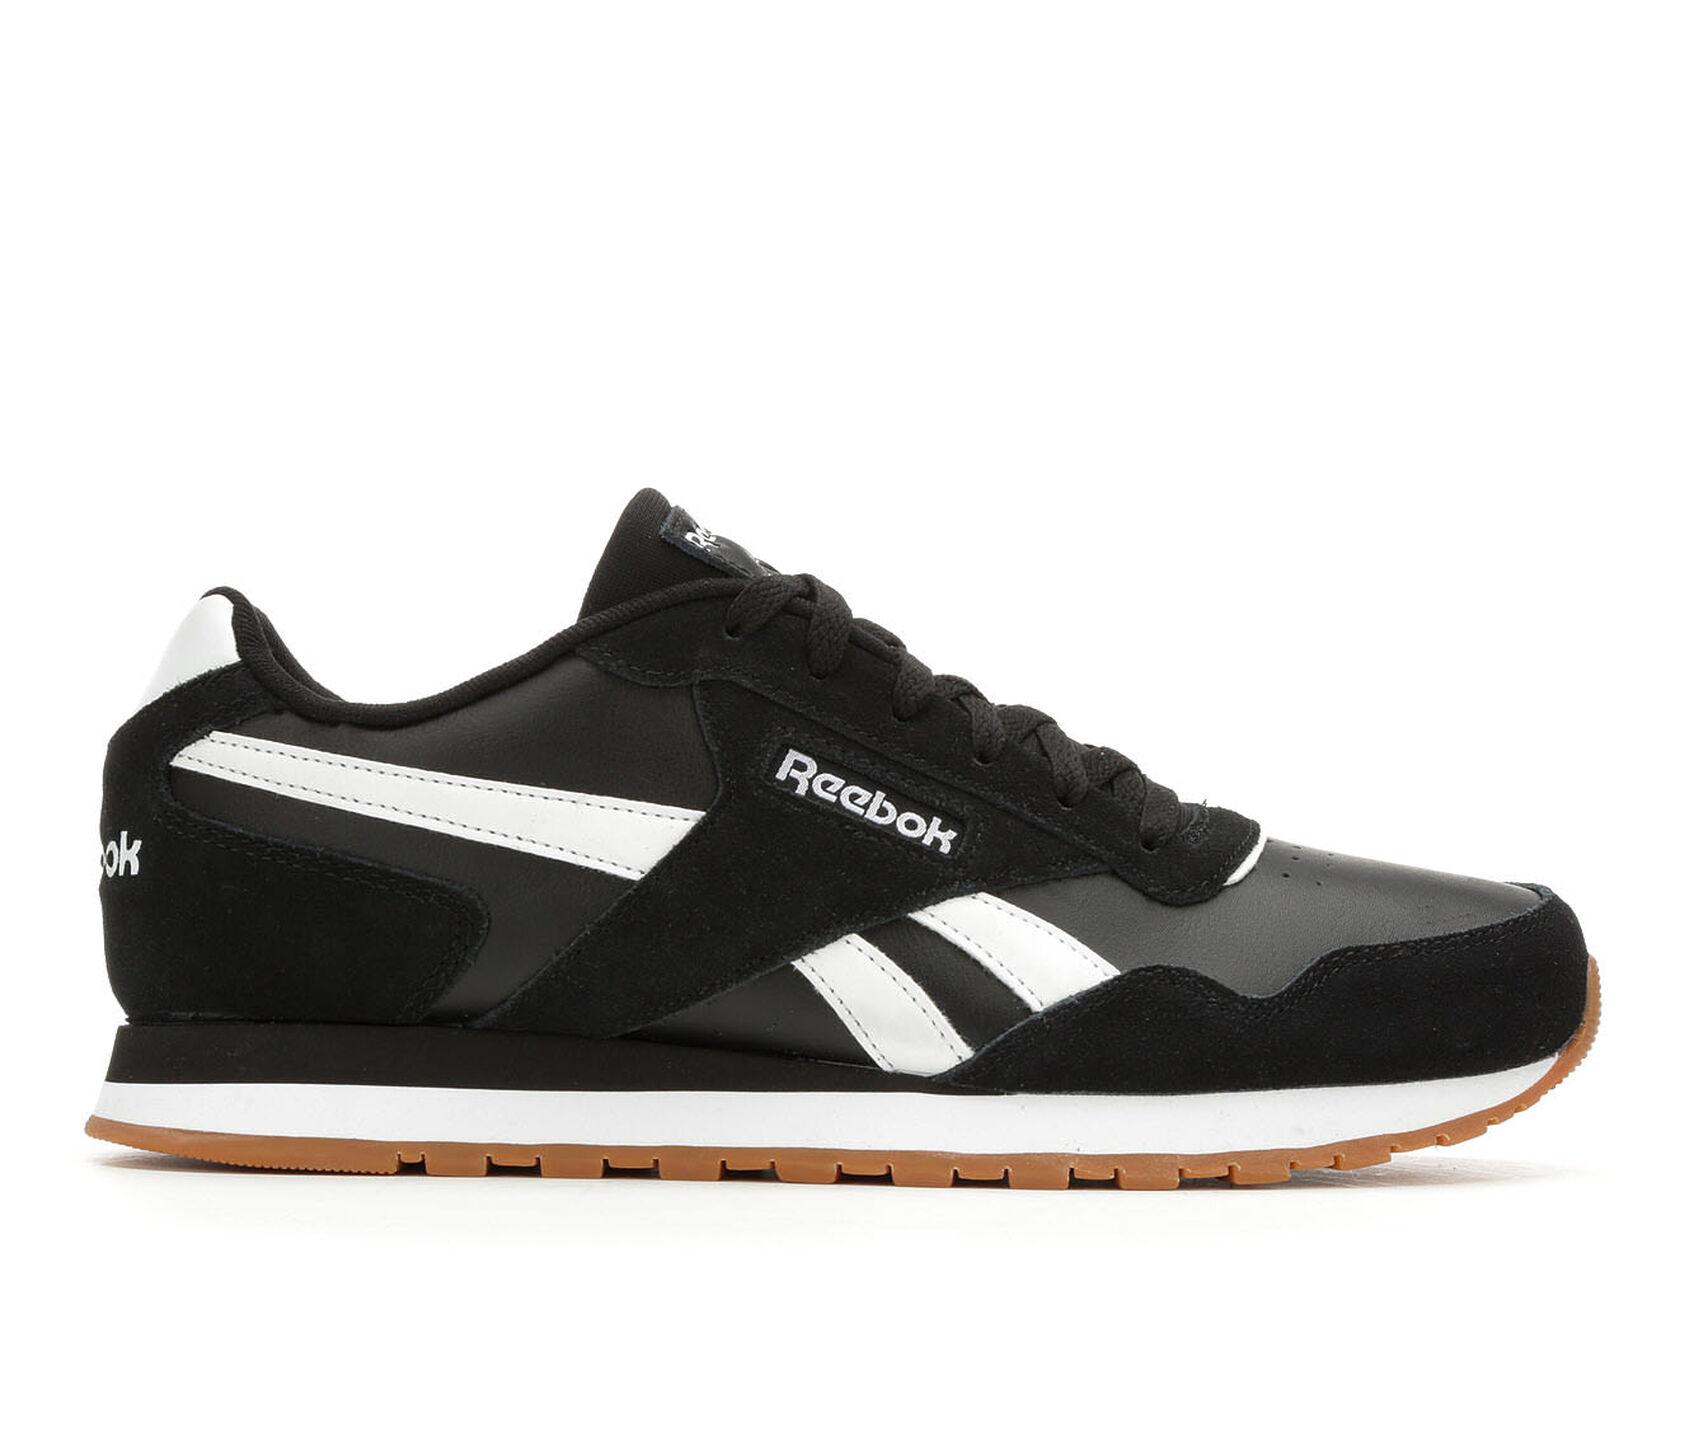 abd3e2c726620 ... Reebok Harman Retro Sneakers. Previous